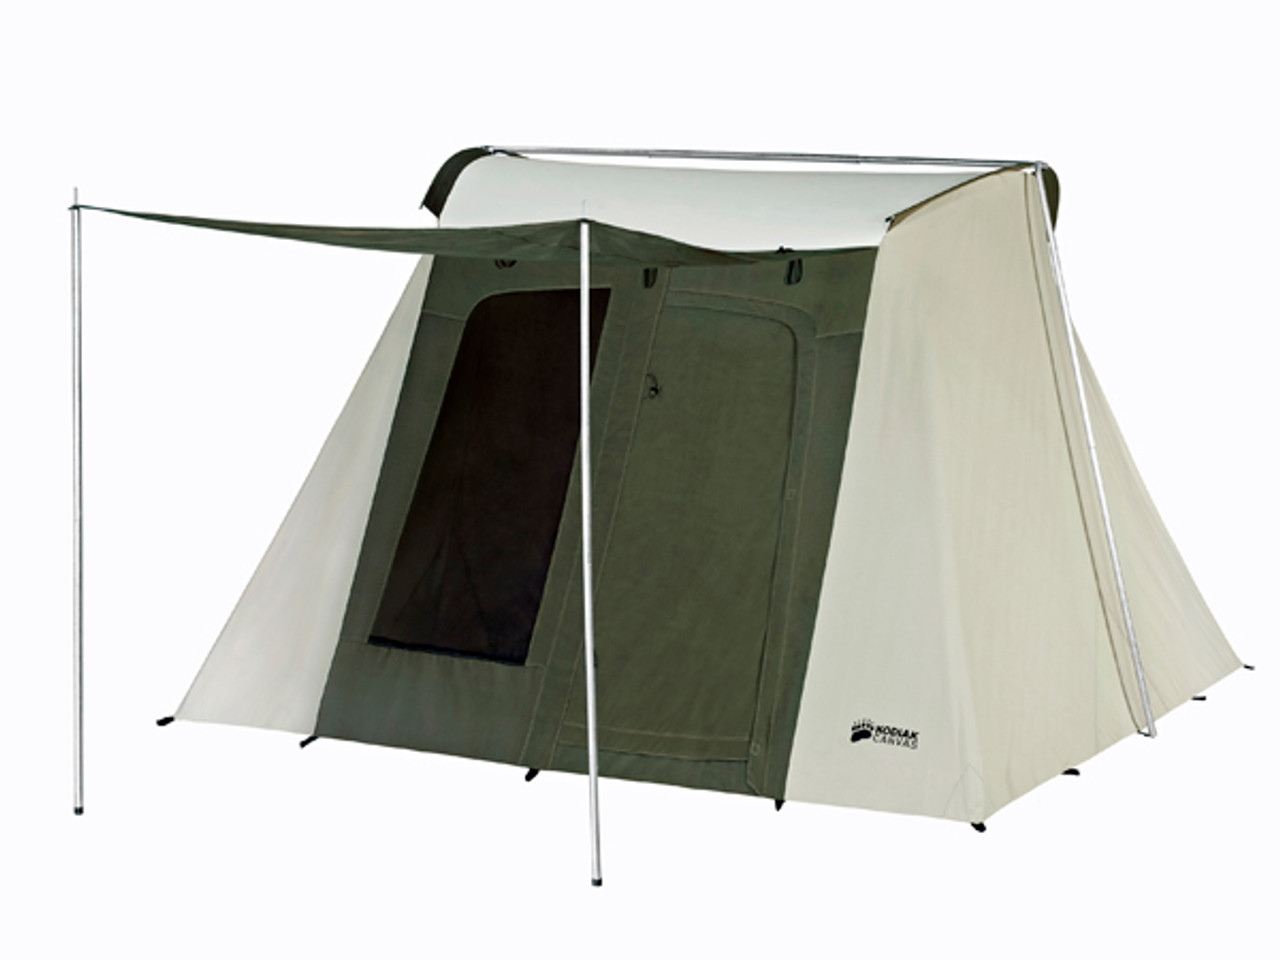 Tent Body 6051 - Estimated Restock Date Oct. 1st, 2021